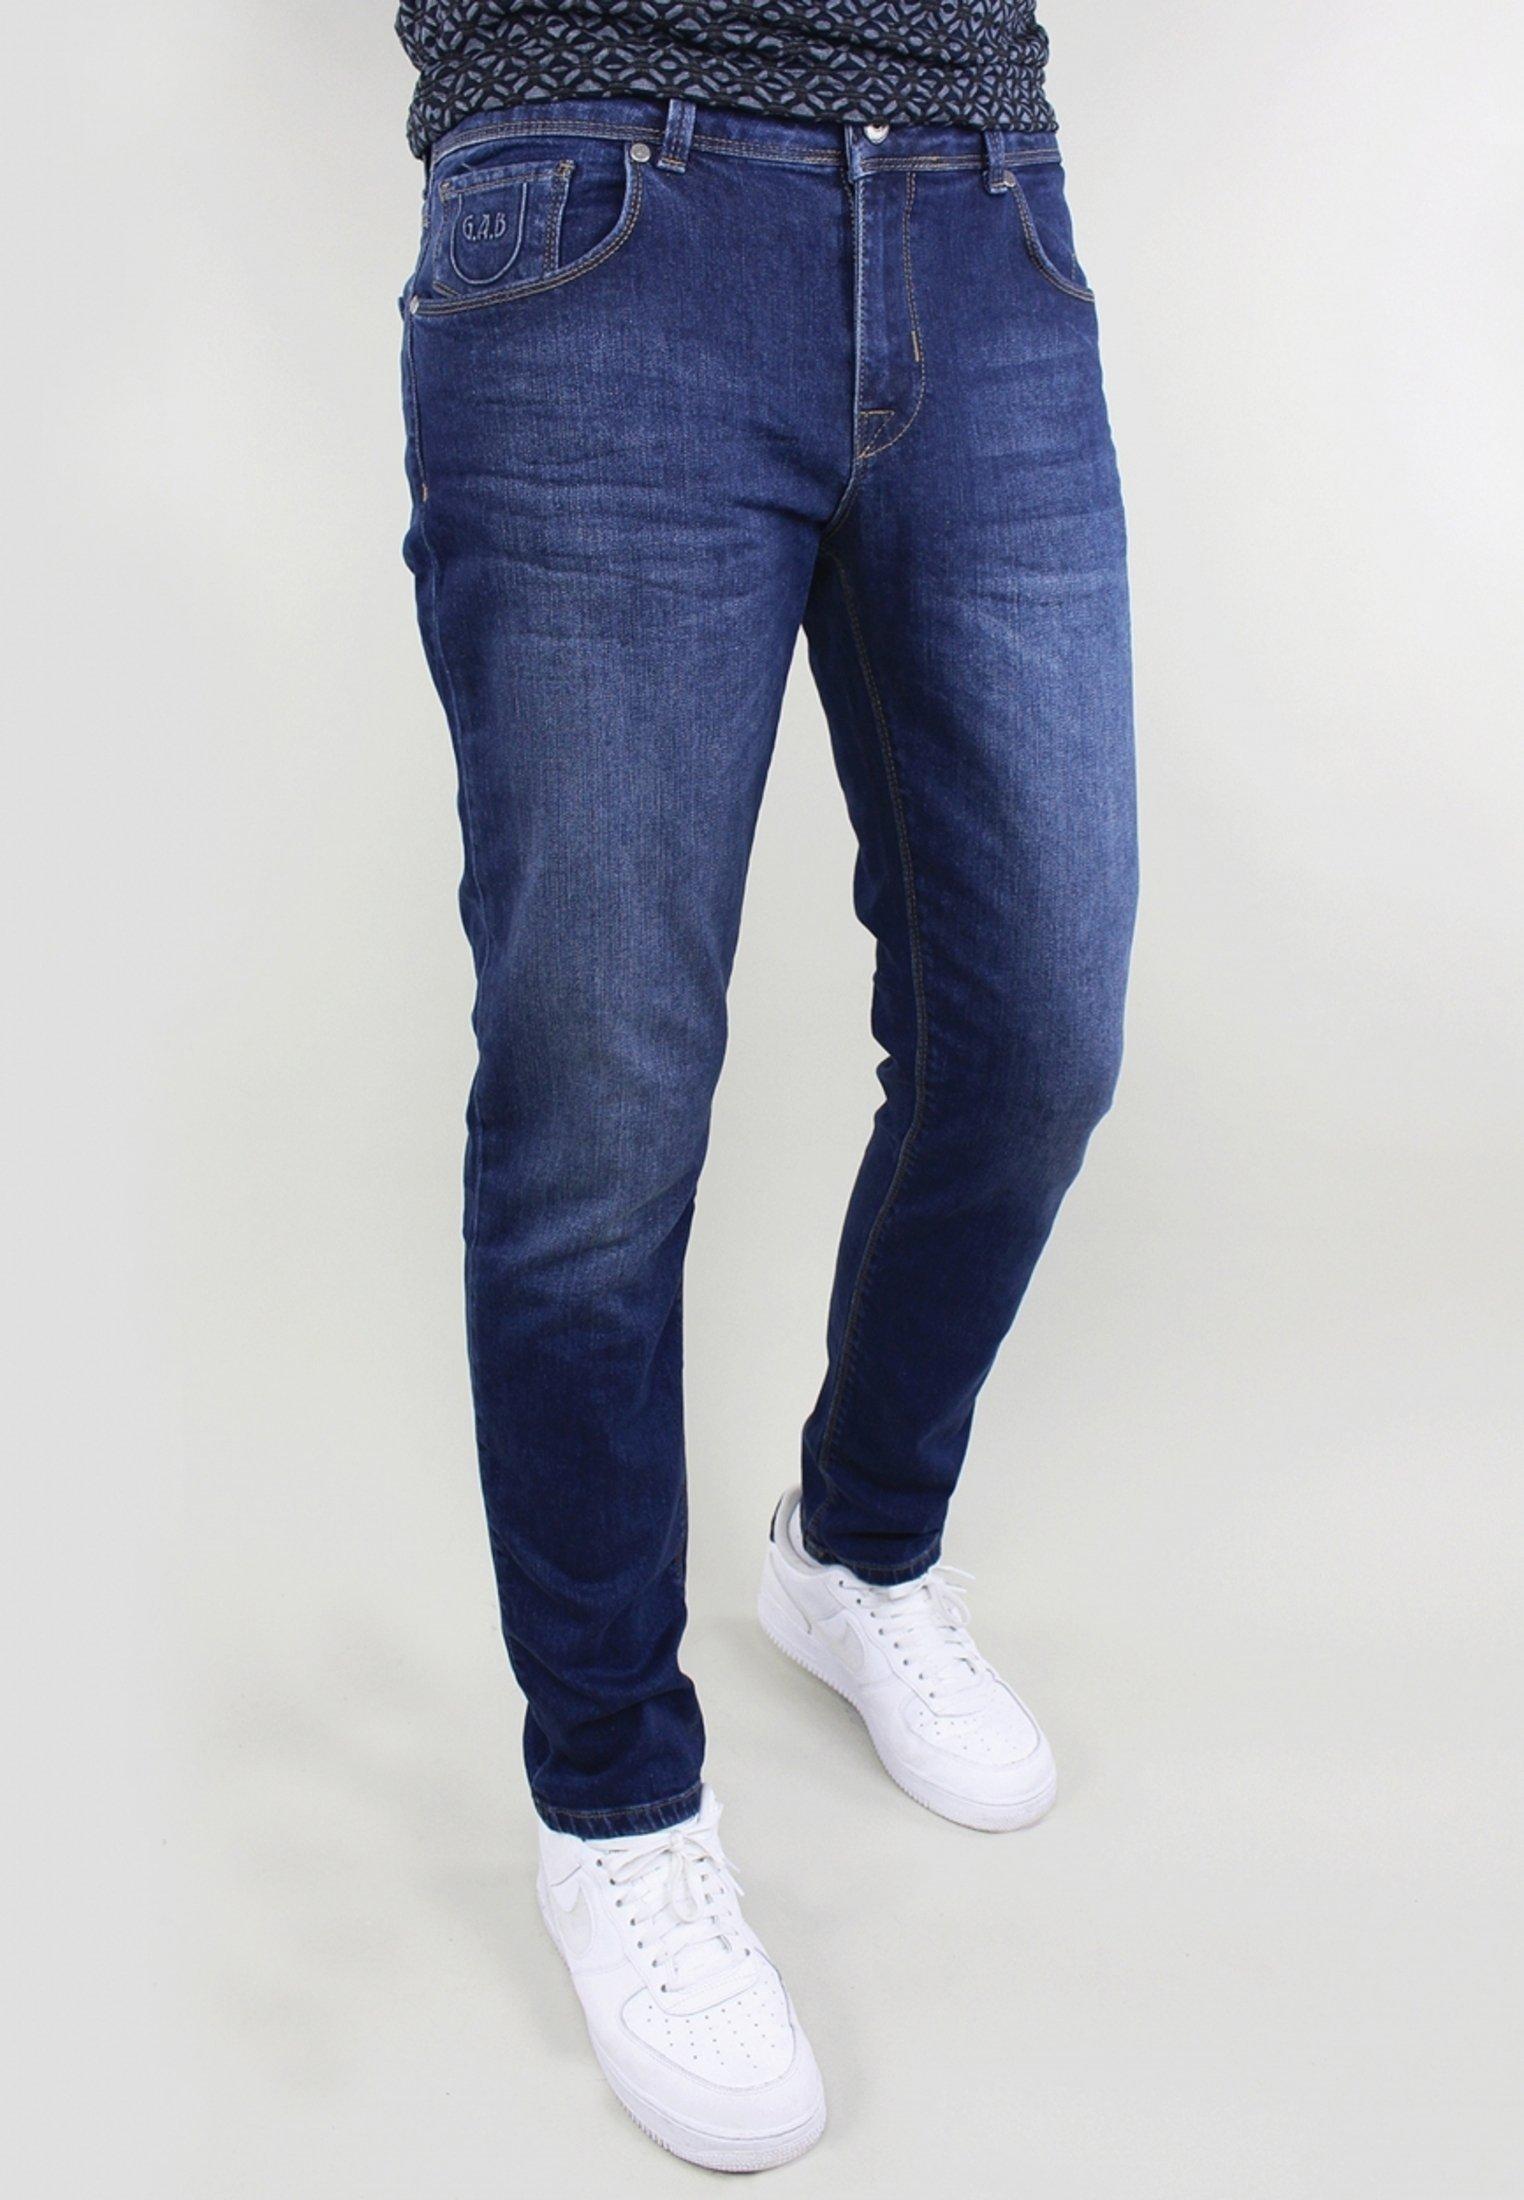 Uomo BERGAMO - Jeans slim fit